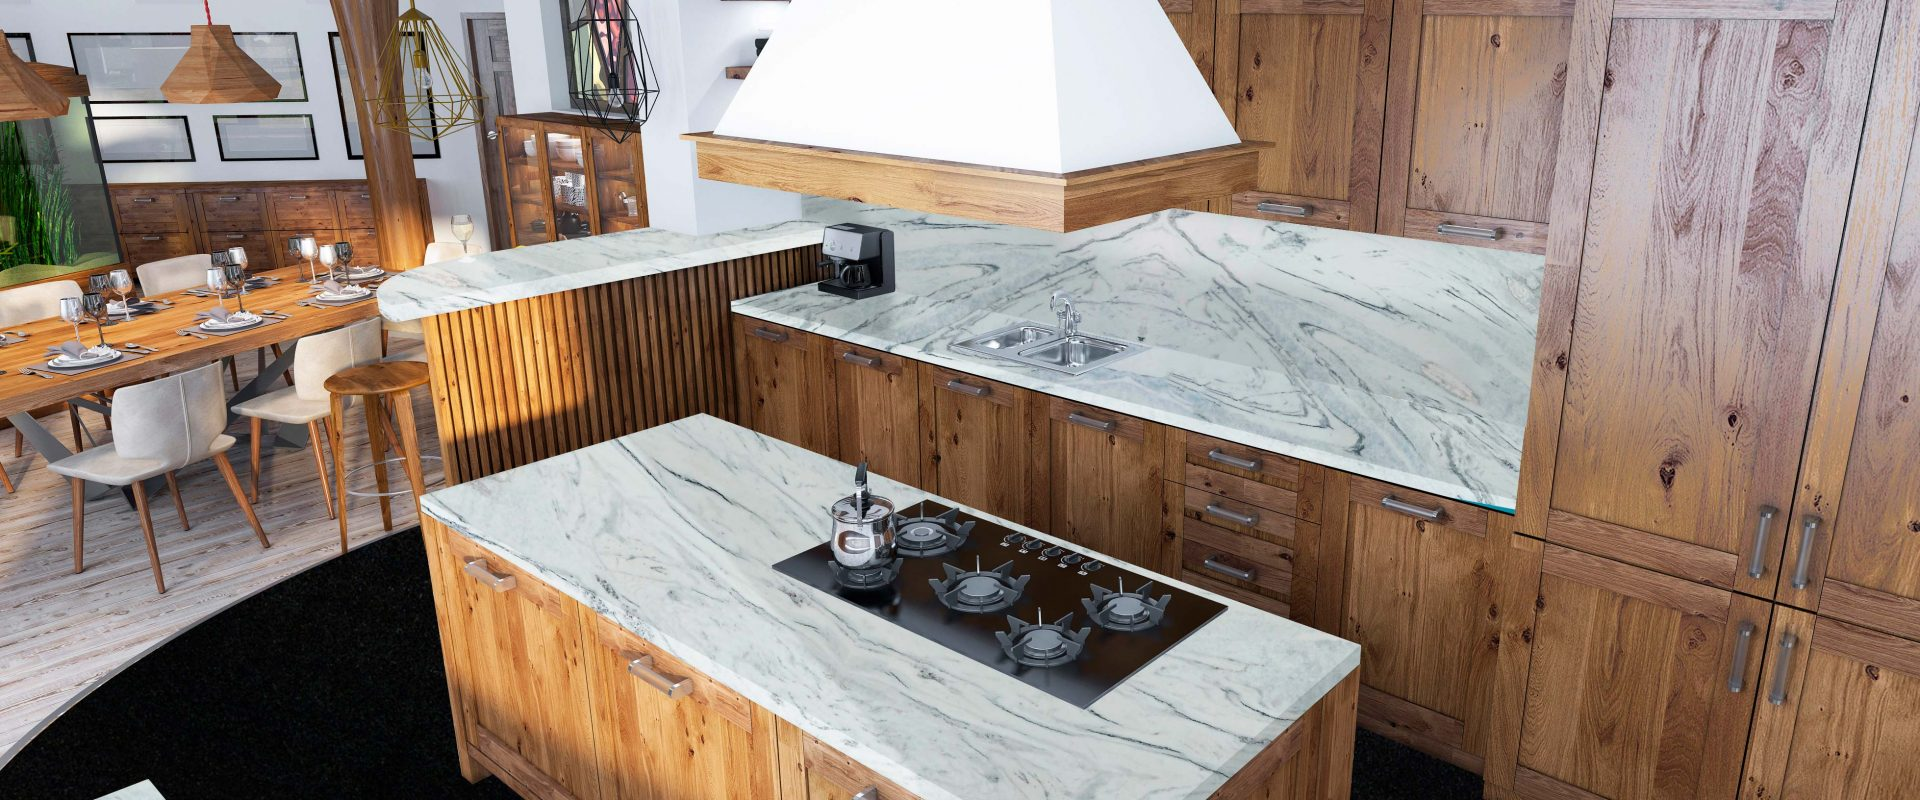 cozinha-topview-madeira-circo-white-193170